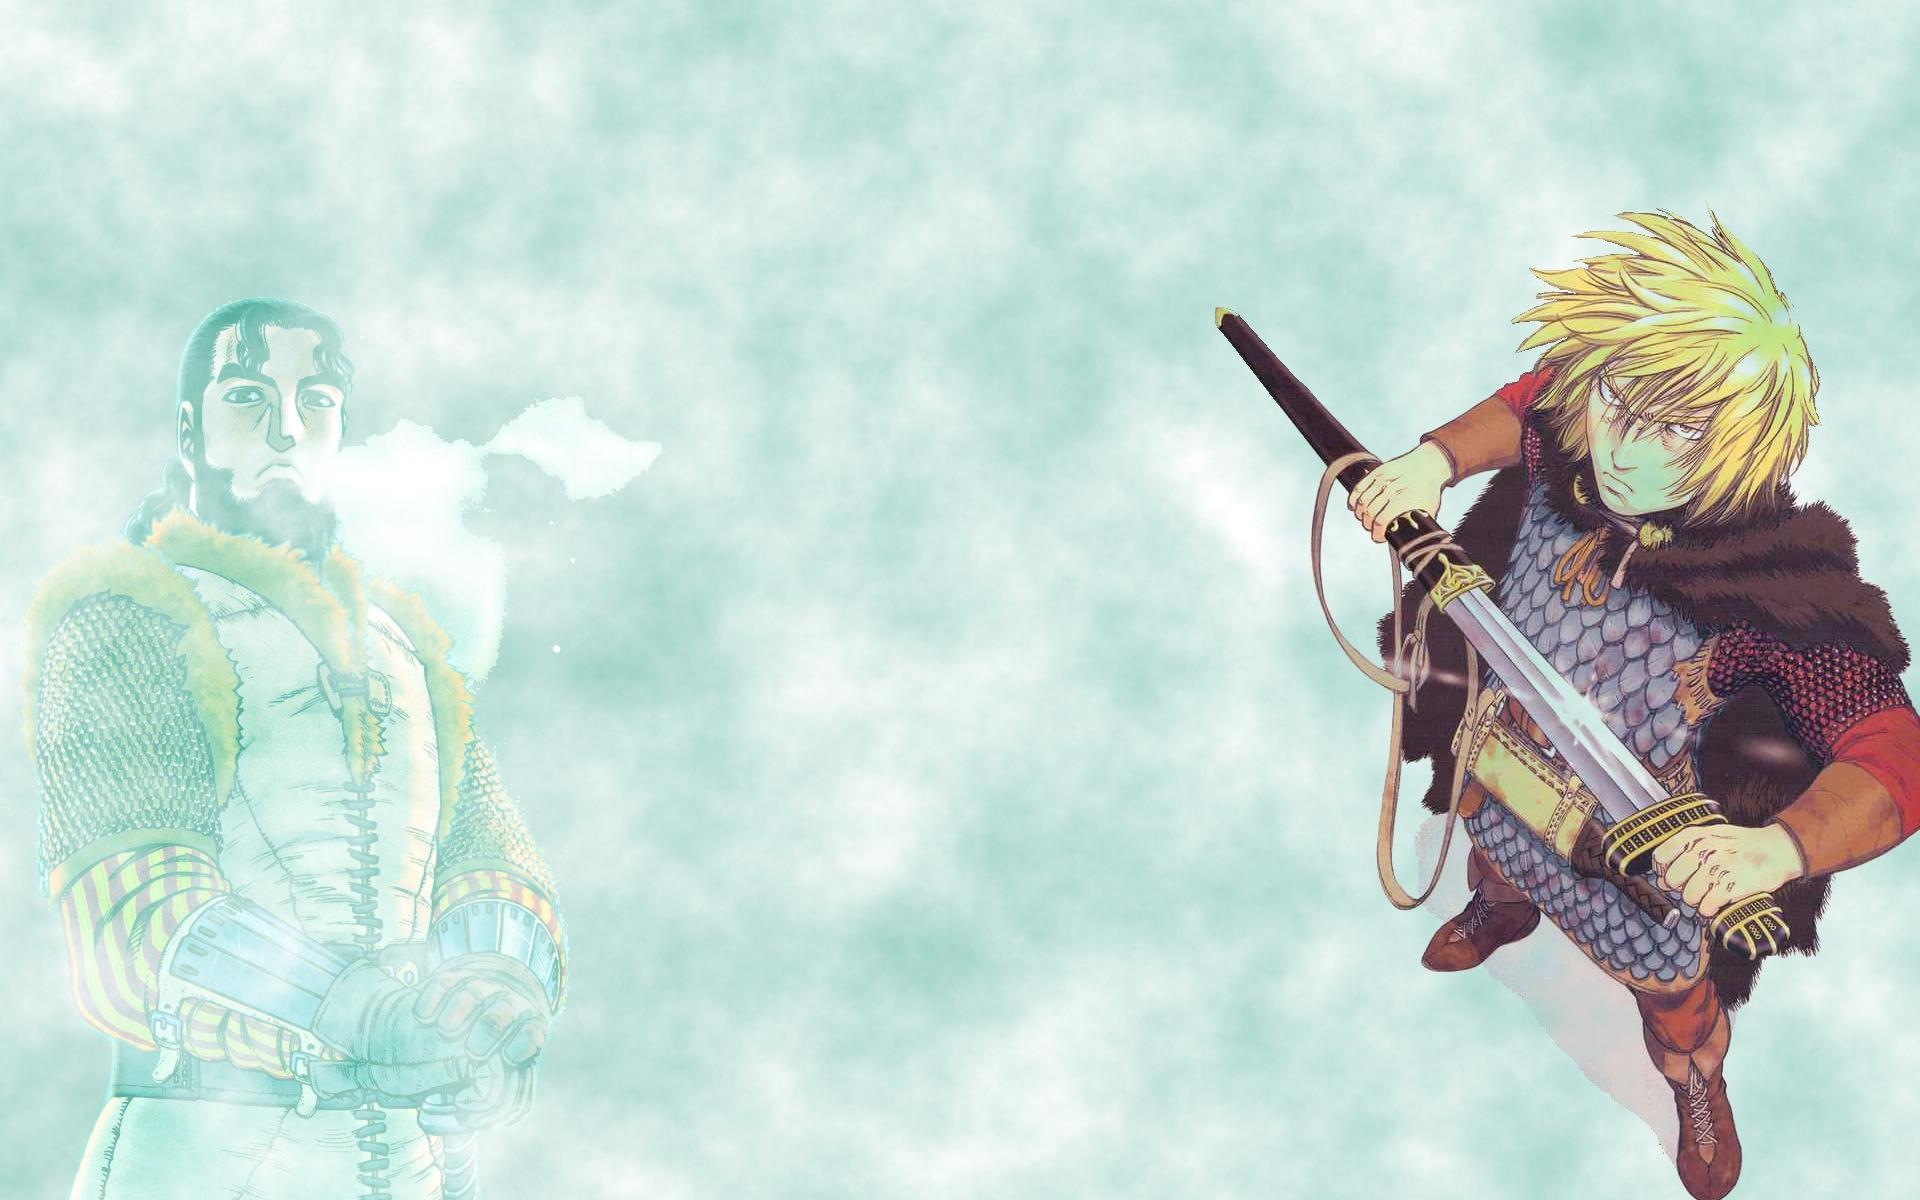 Anime 1920x1200 anime Vinland Saga sword fantasy art